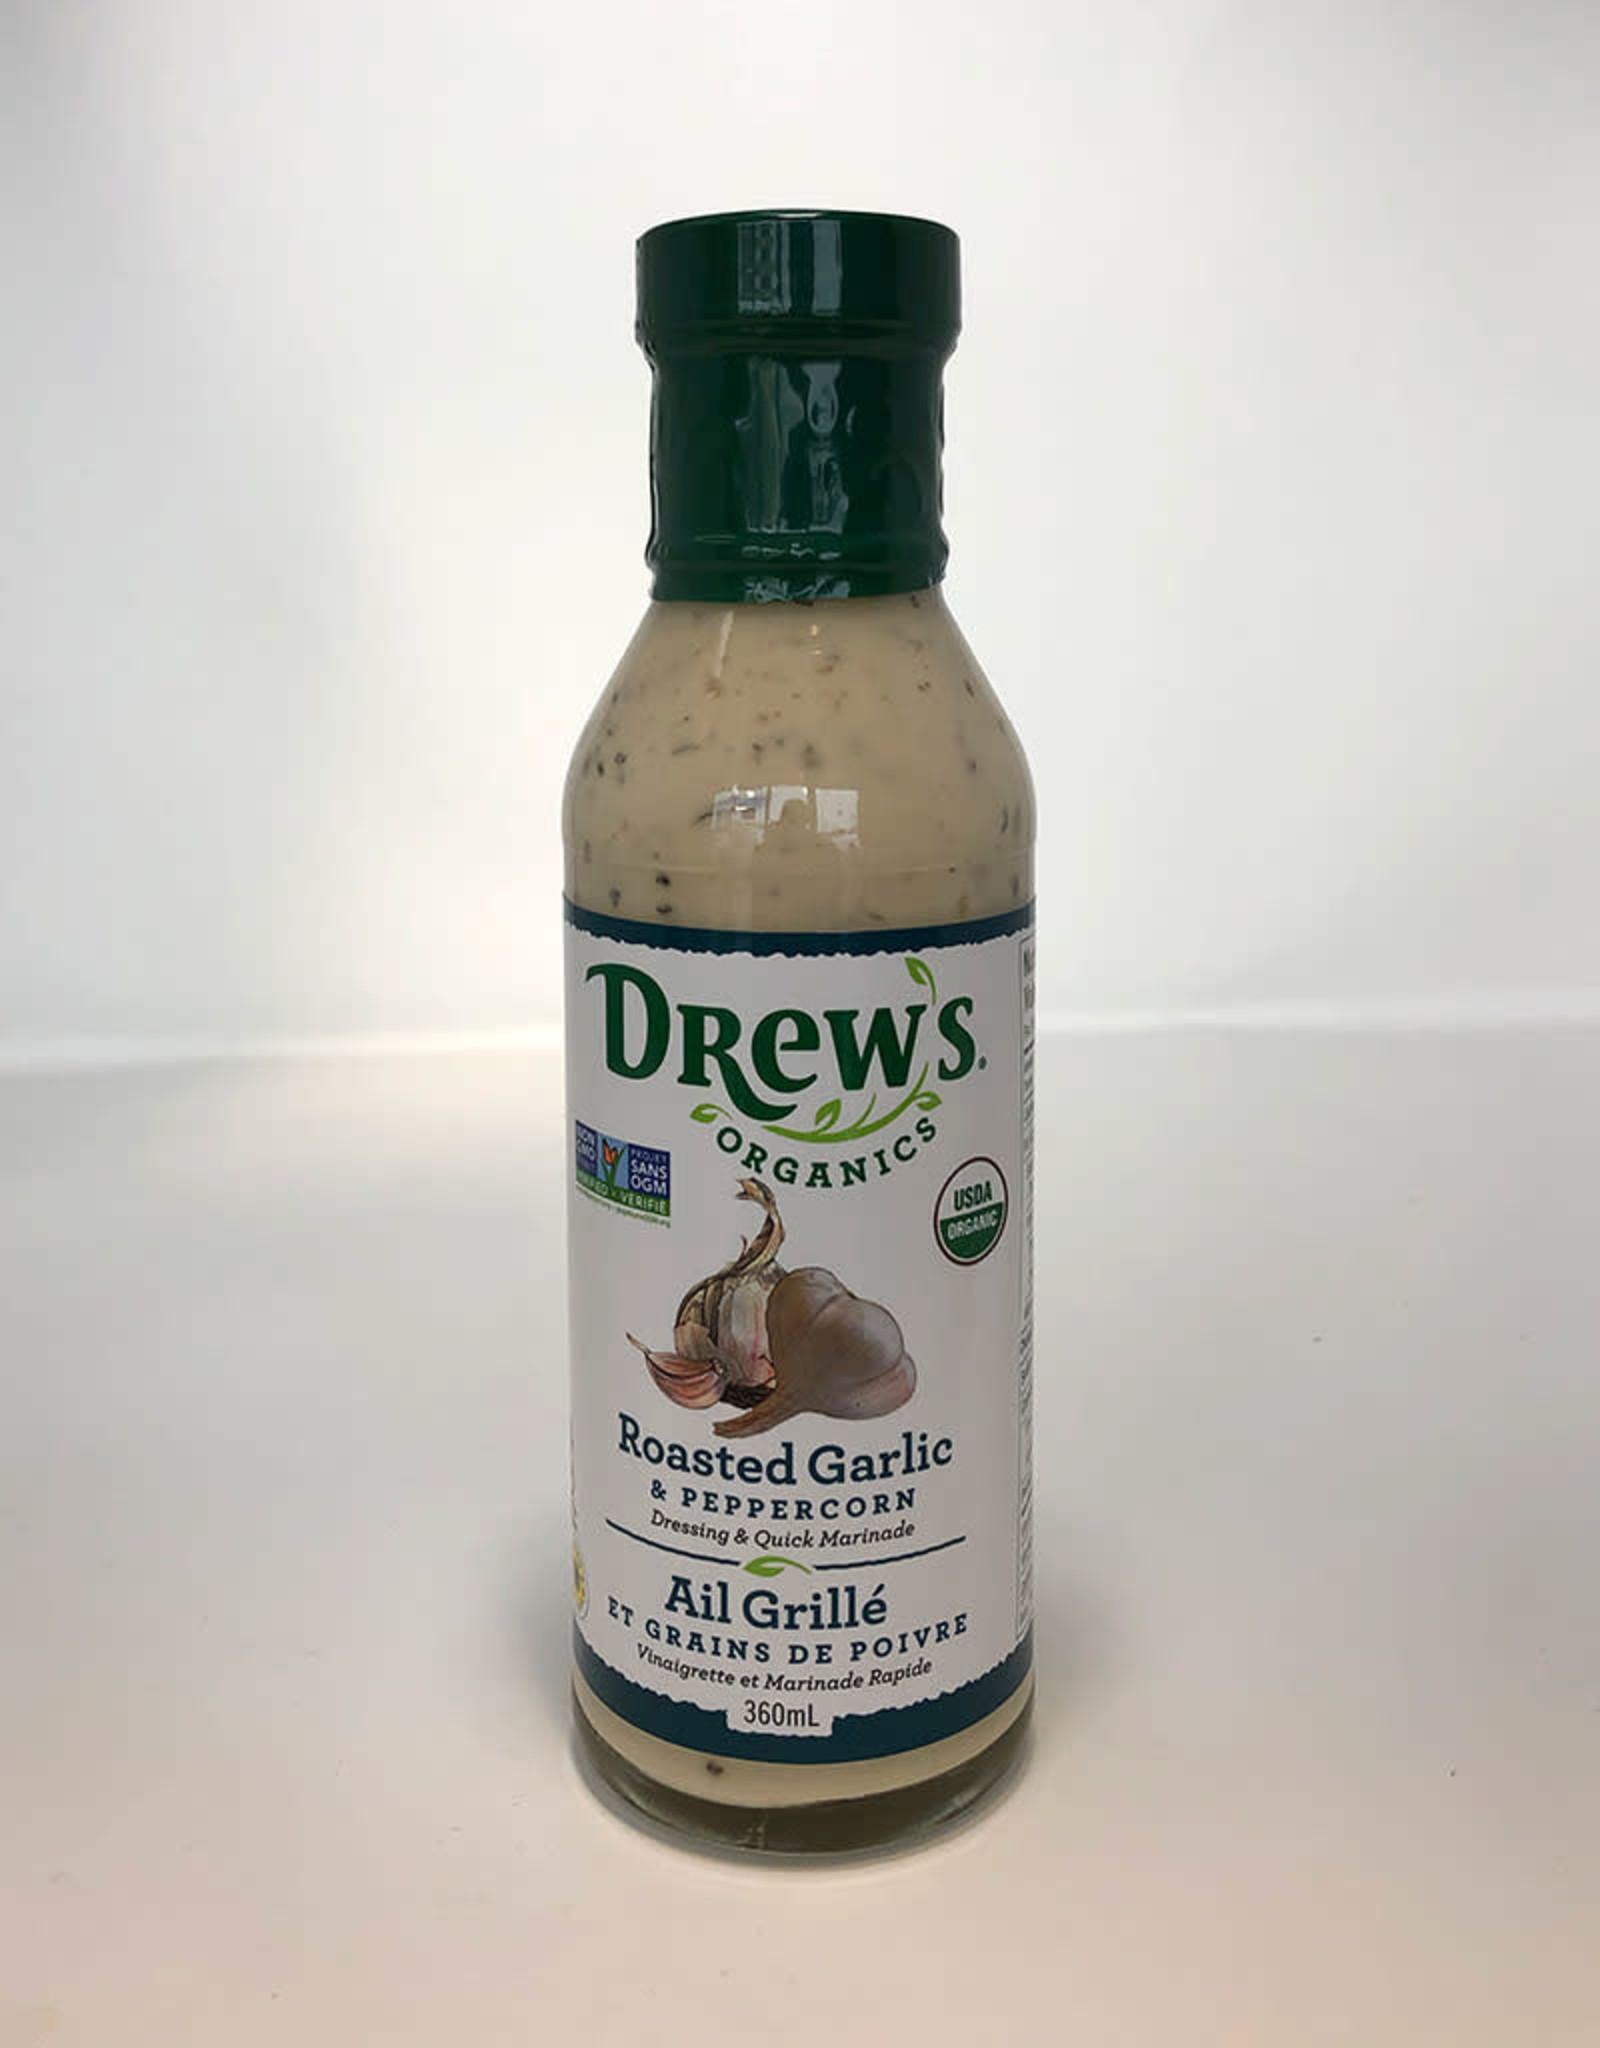 Drews Organics Drews - Organic Dressing, Roasted Garlic & Peppercorn